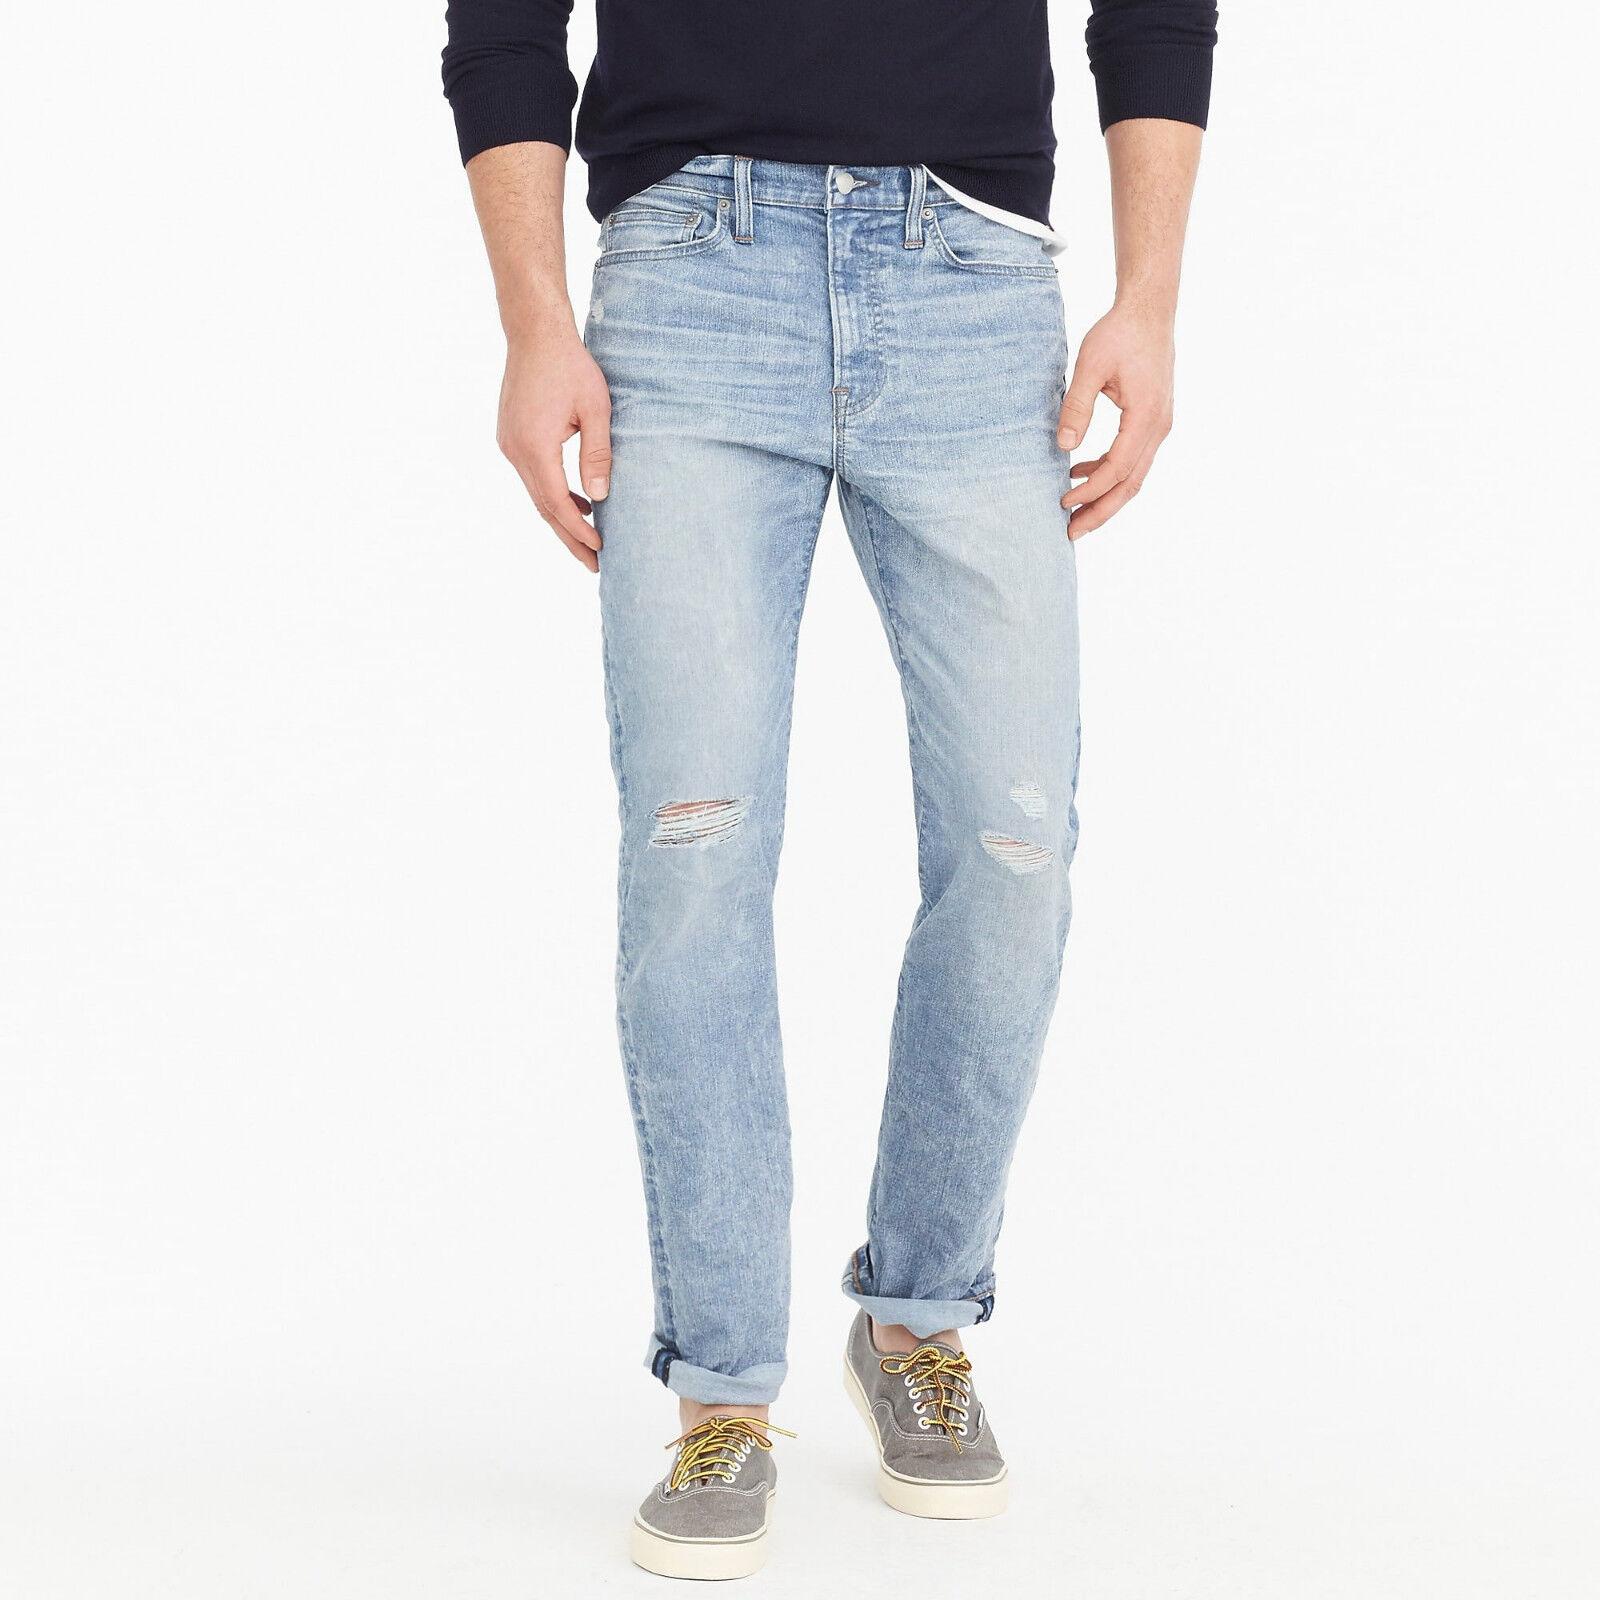 J. Crew 770 Cone Denim Men's Straight-fit Distressed Stretch Jeans NEW 36x32